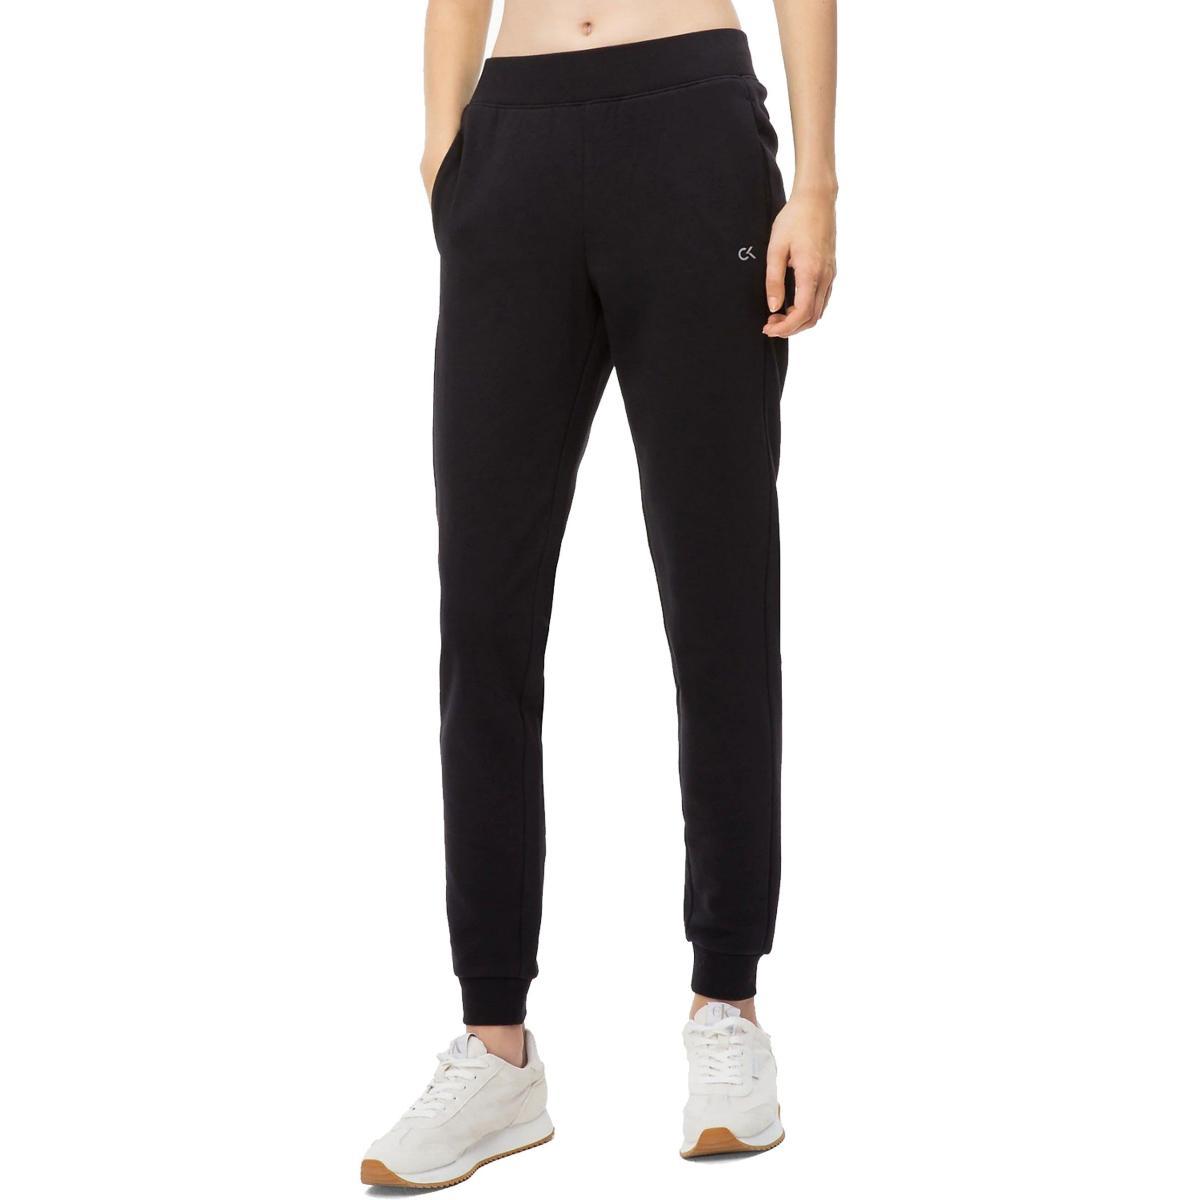 Pantalone tuta Jogger Calvin Klein Performance da donna rif. 00GWF8P677